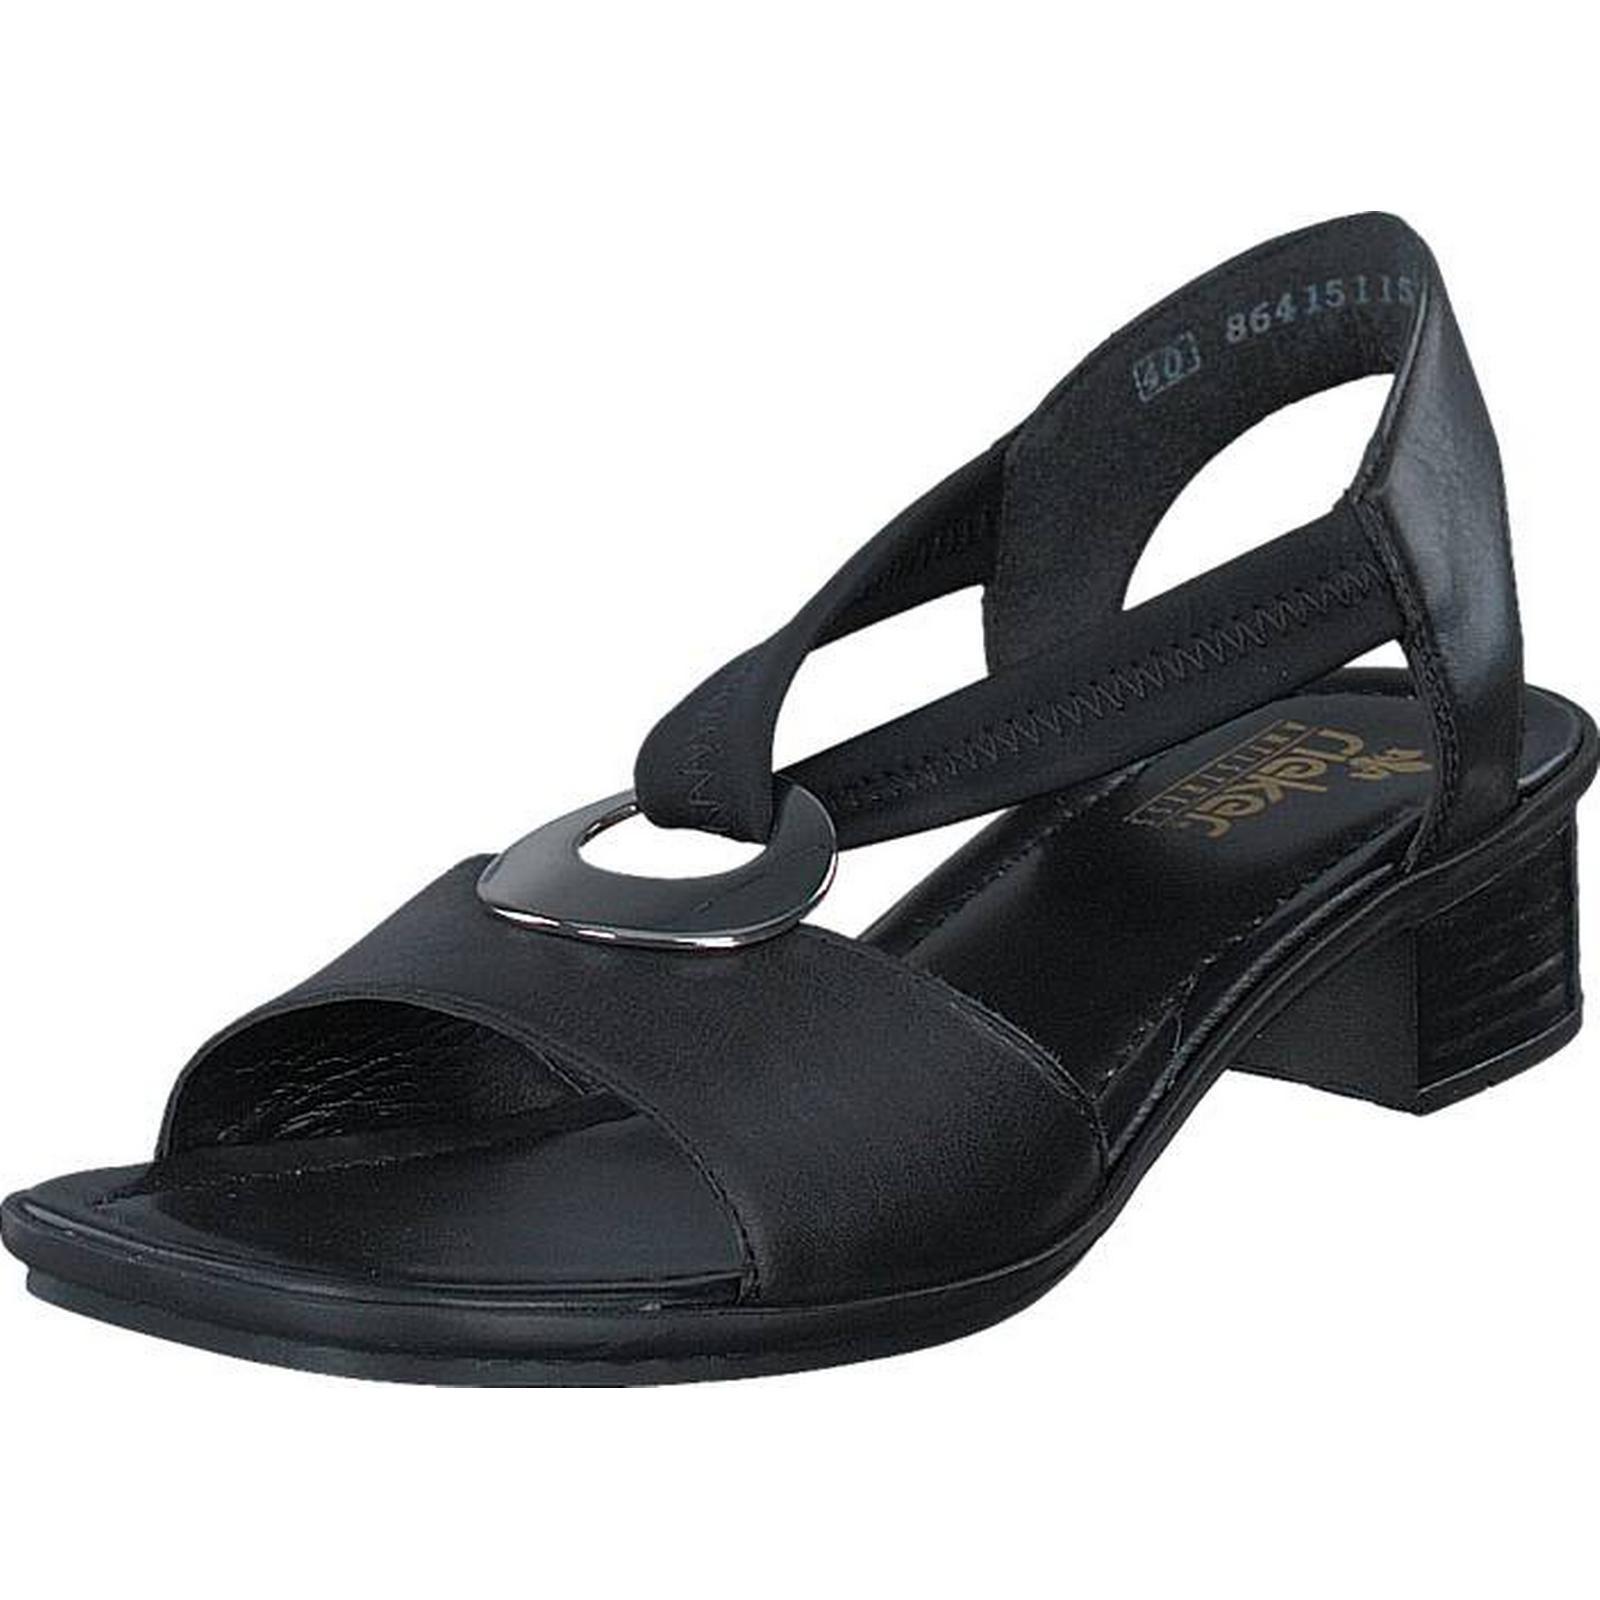 Rieker 62662-01 62662-01 Rieker Black, Shoes, Heels, Low-heeled Clogs, Black, Female, 38 b9a3ff